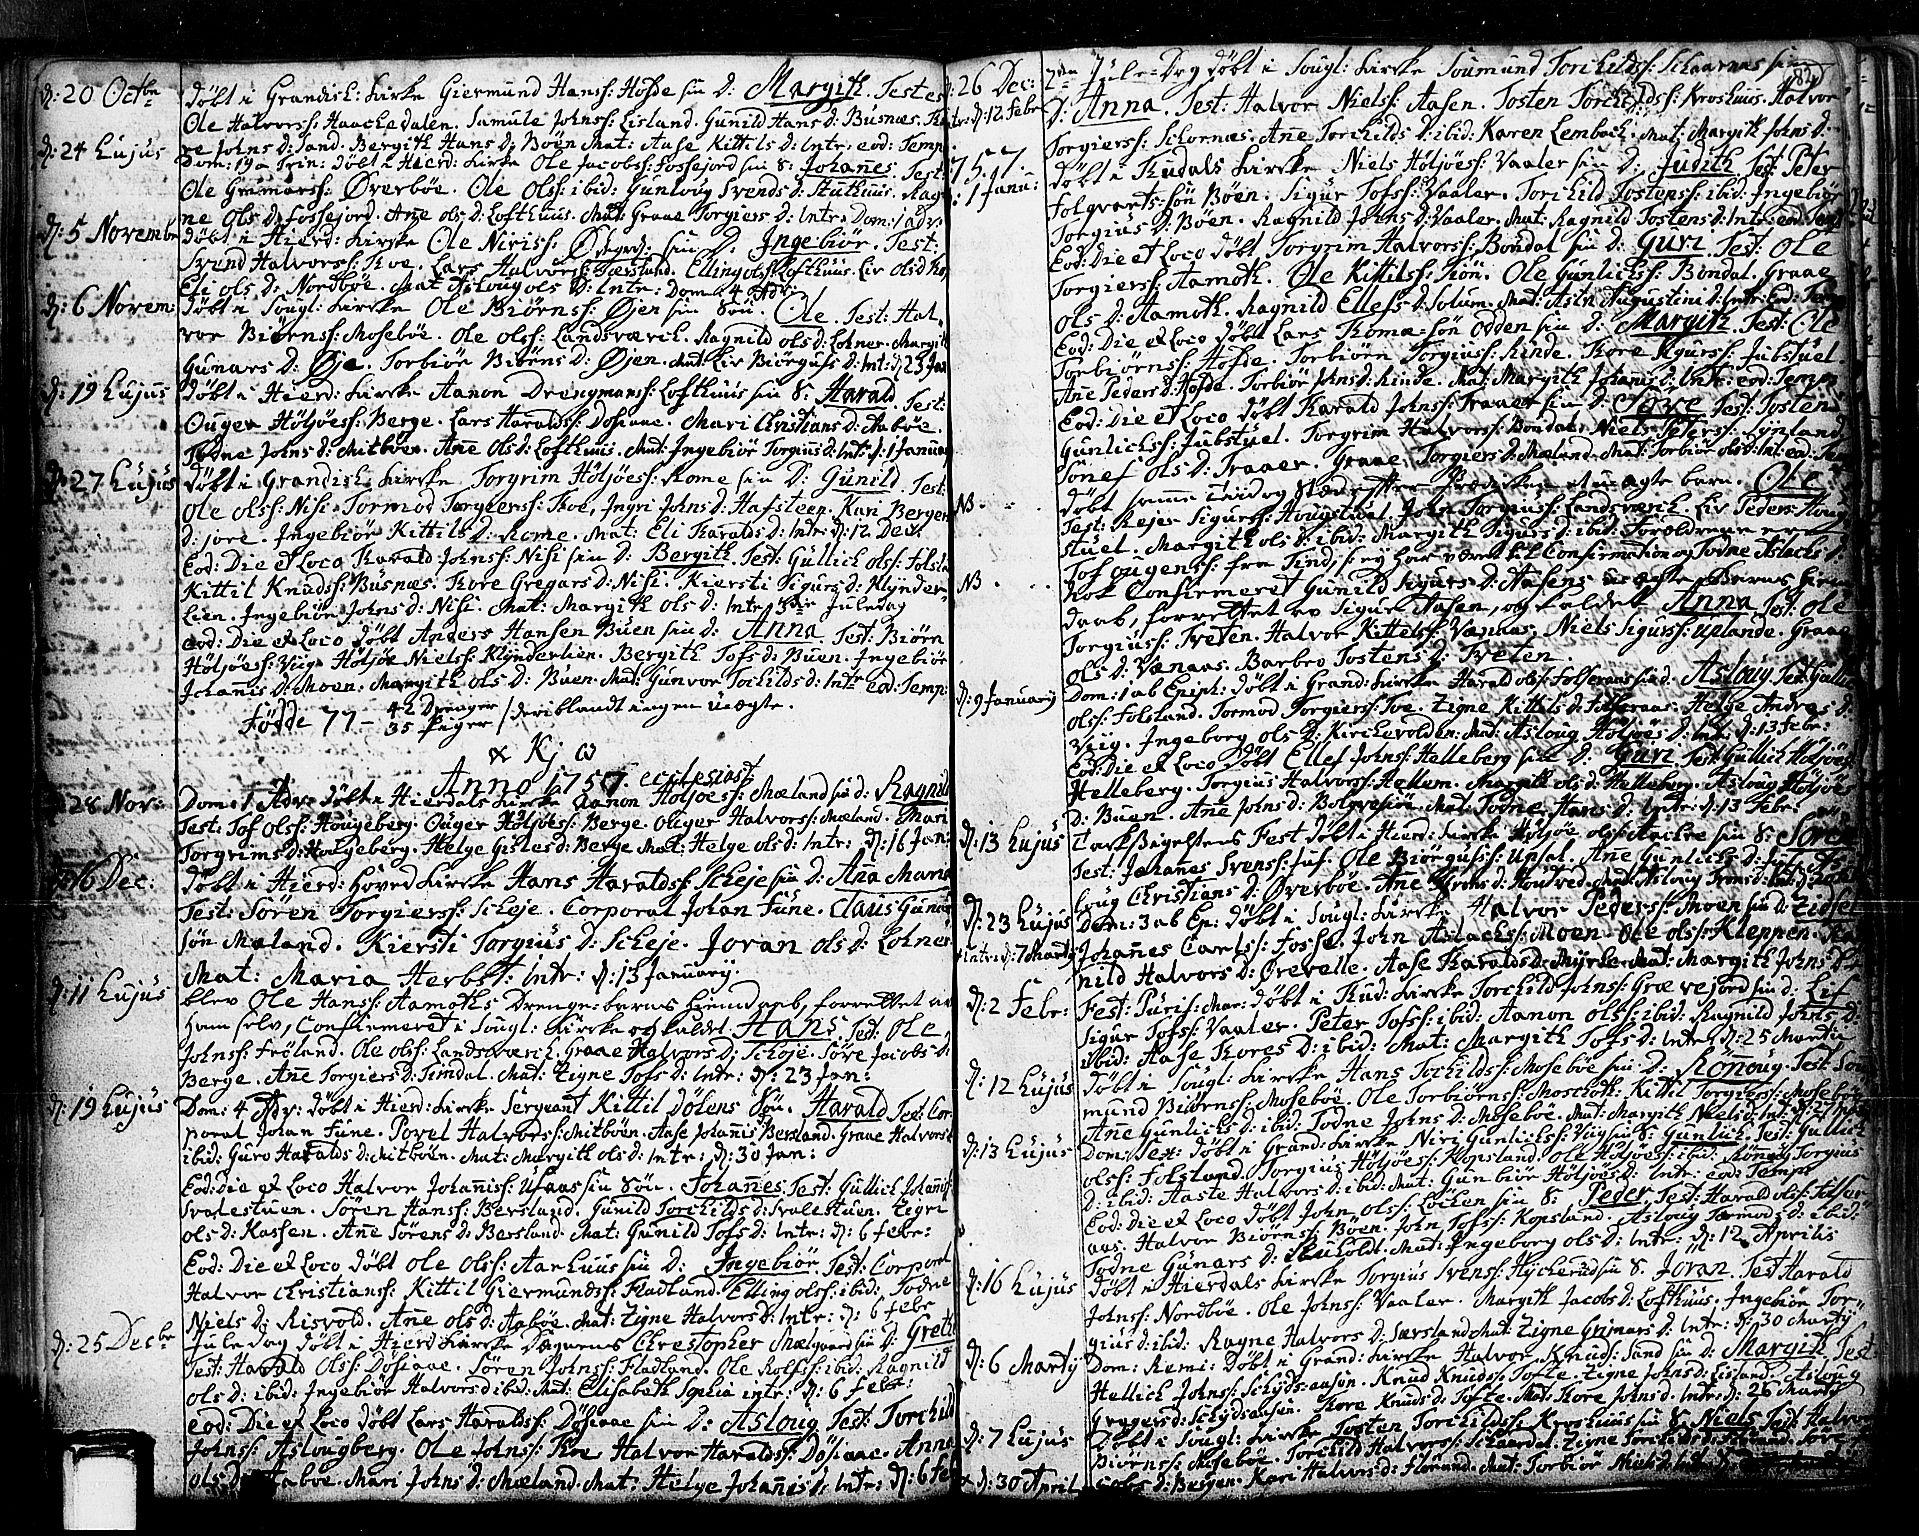 SAKO, Hjartdal kirkebøker, F/Fa/L0003: Ministerialbok nr. I 3, 1727-1775, s. 82